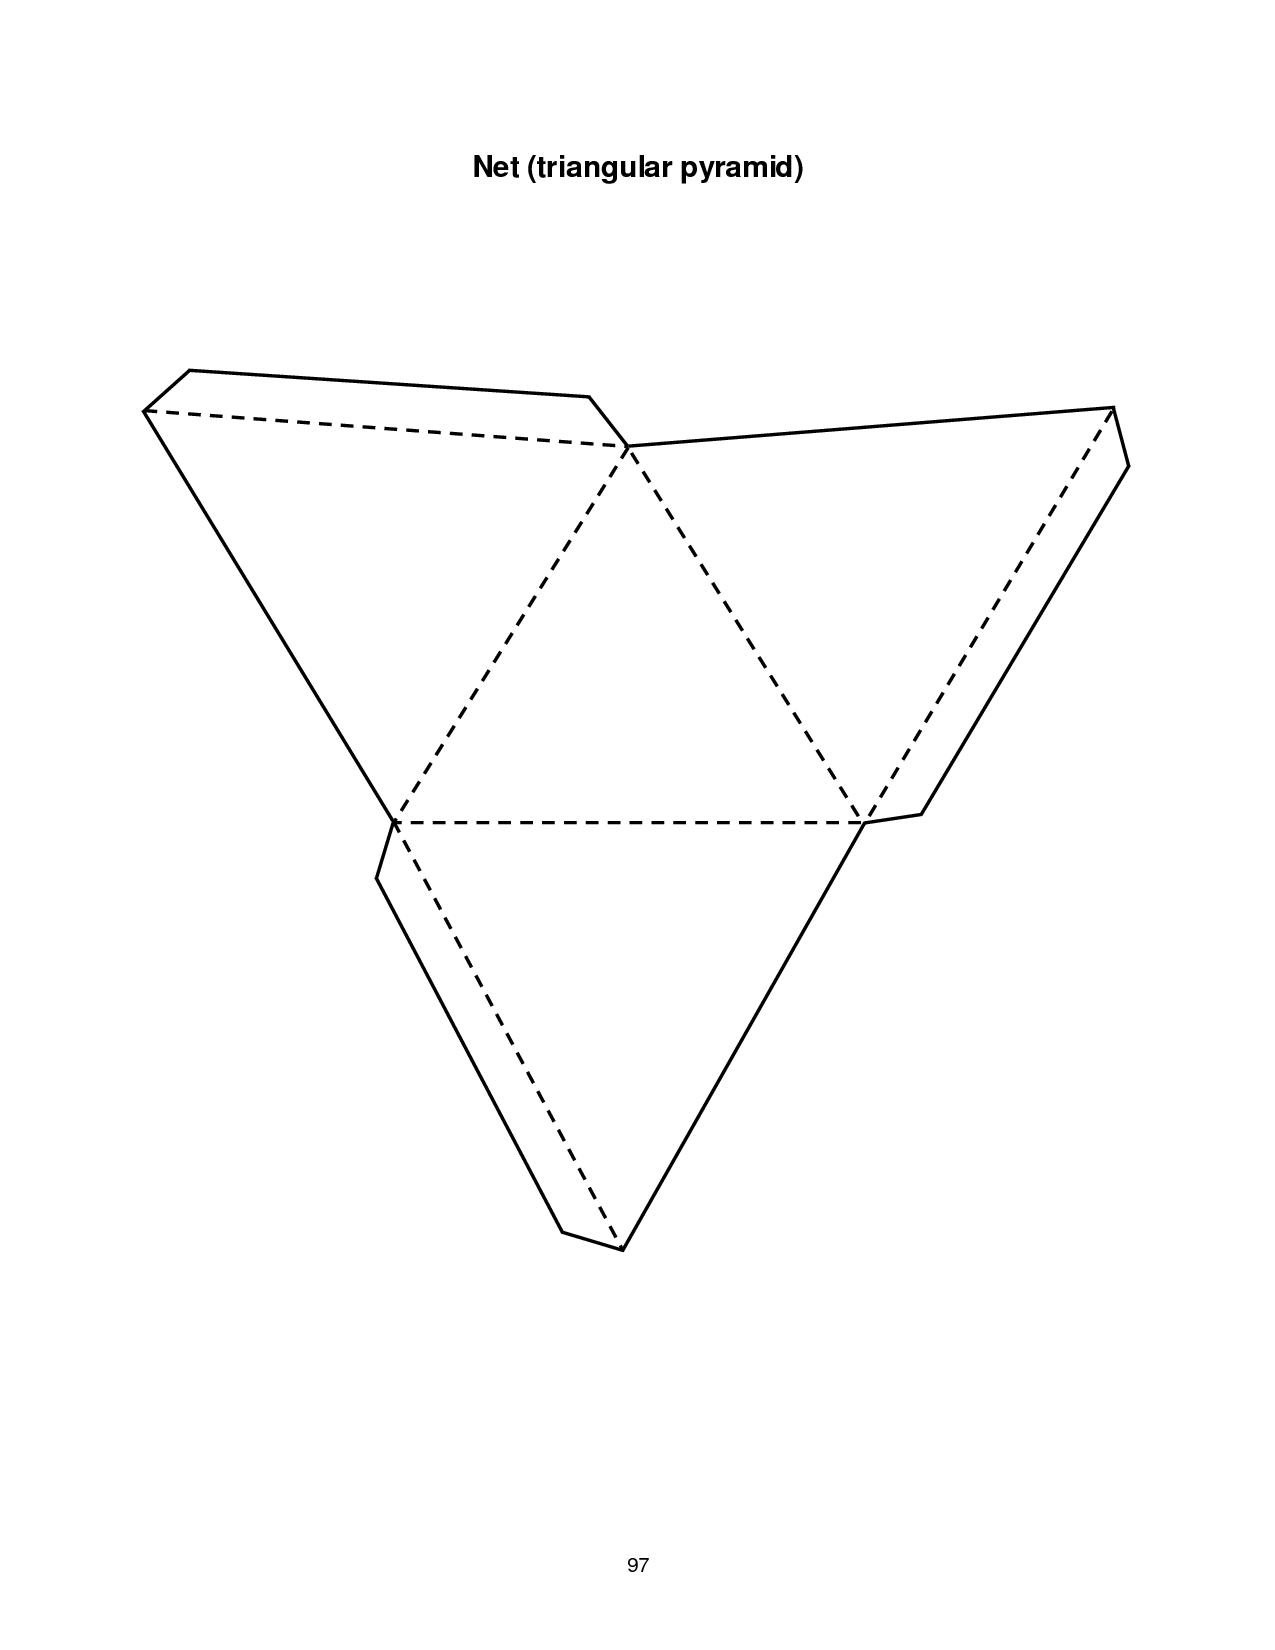 Triangular pri